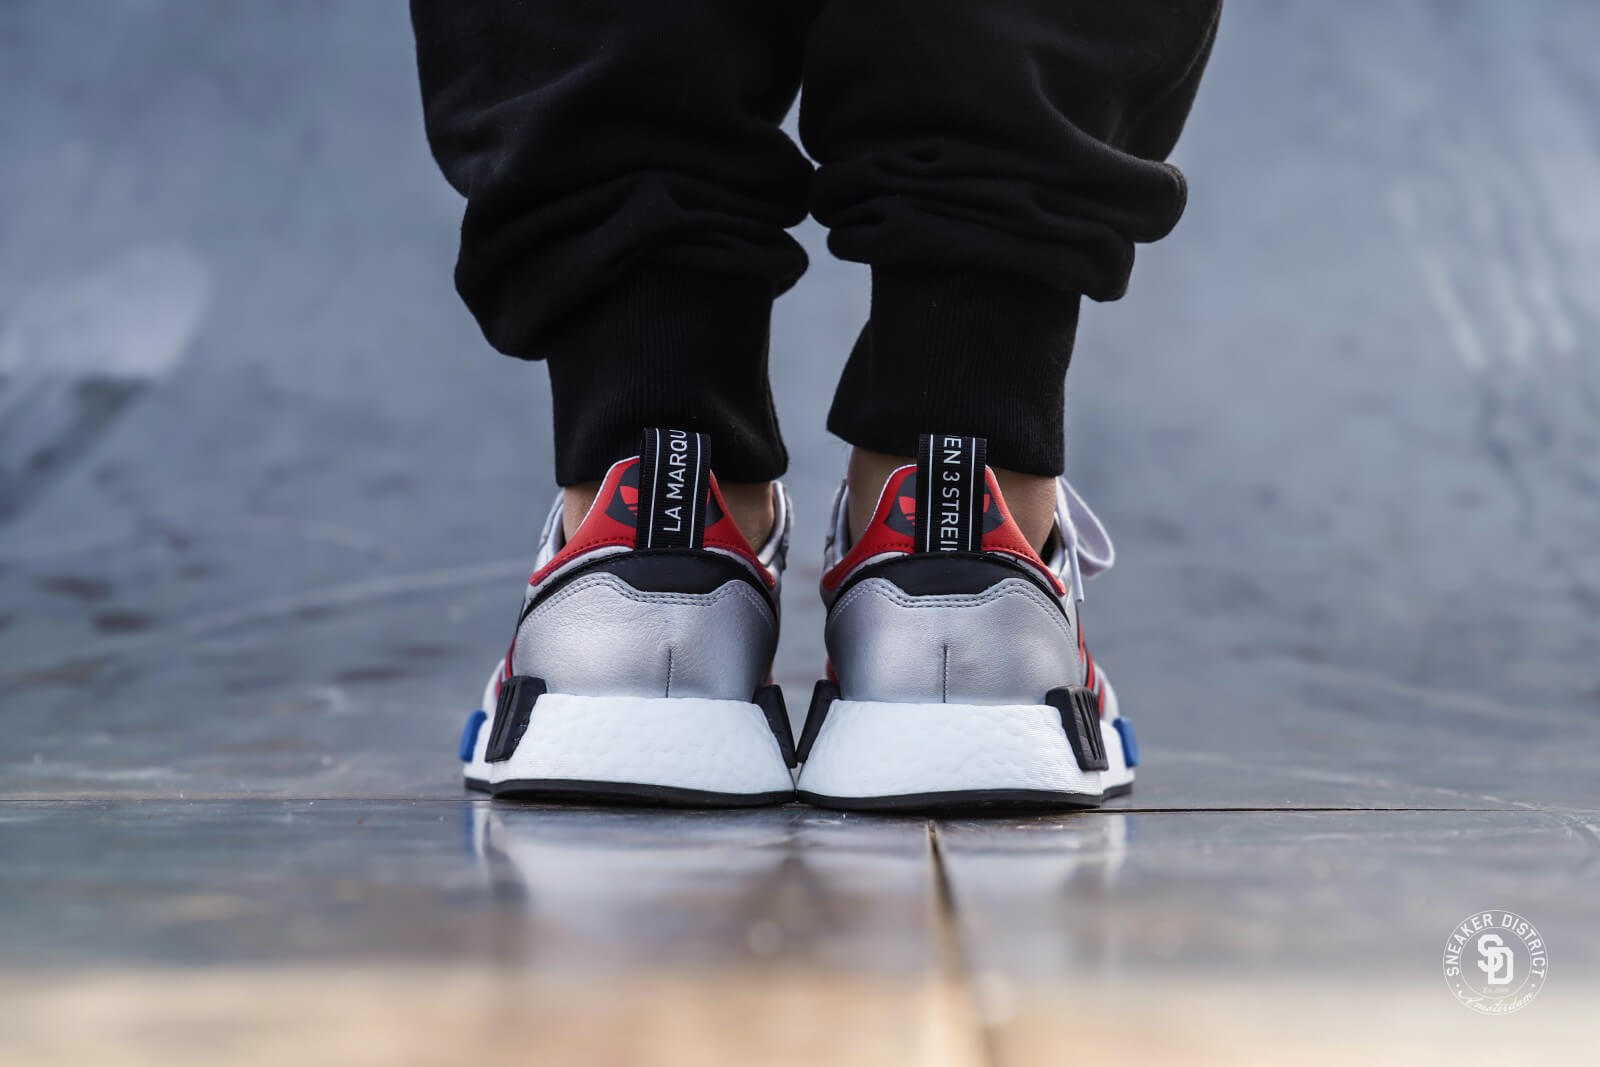 Adidas Rising Star x R1 Silver Metallic